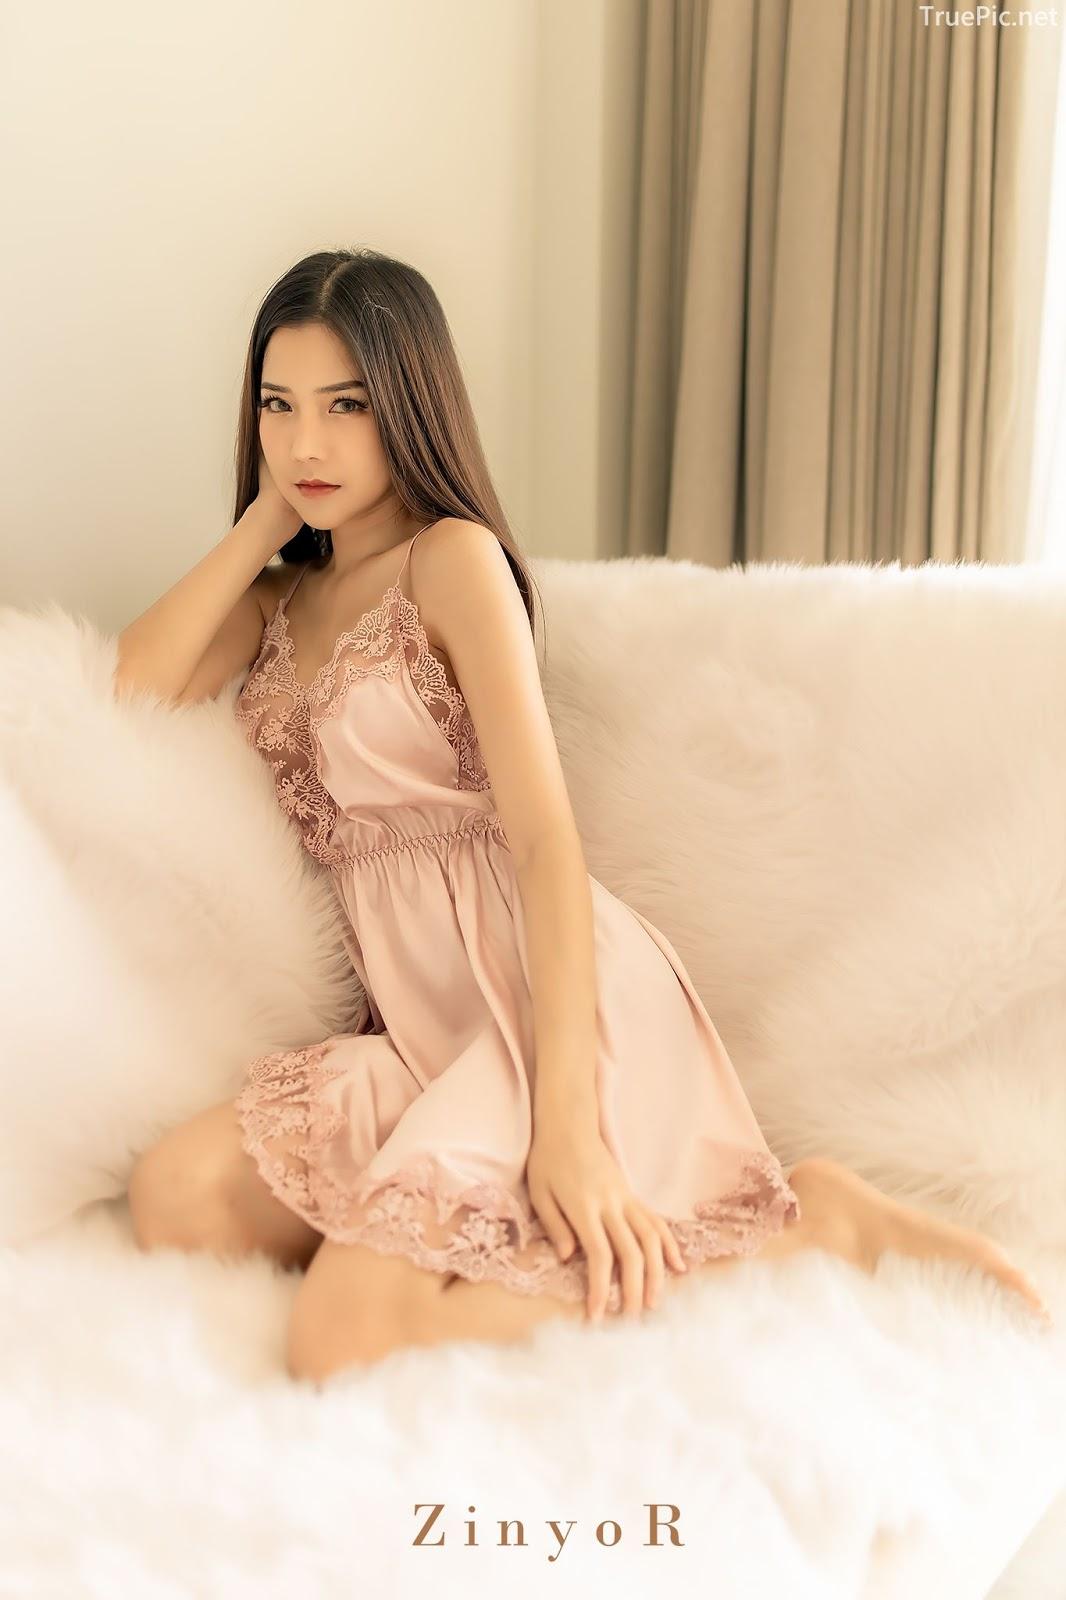 Thailand sexy models - Pattamaporn Keawkum & Mind Varunrapat & Phitchamol Srijantanet - Concept : Thailand victoria's secret - Picture 2